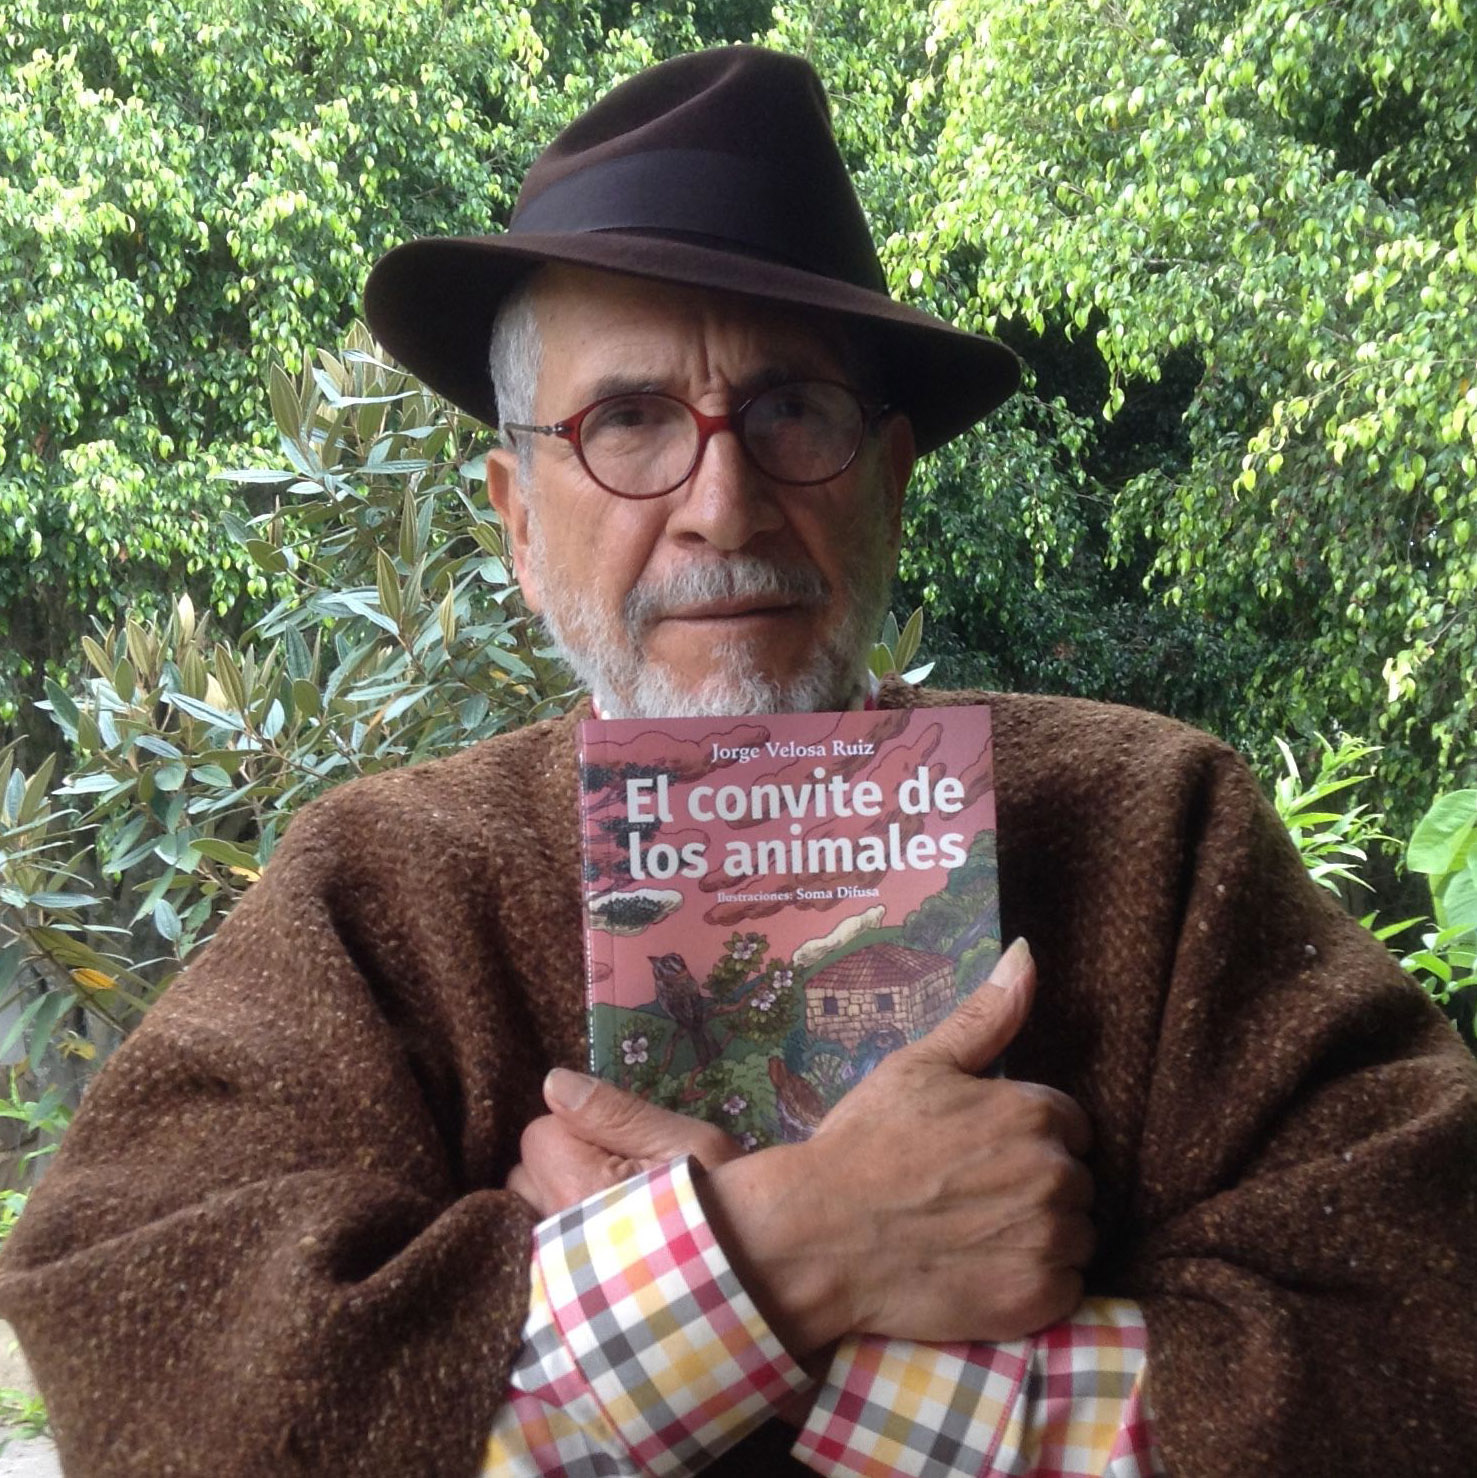 Jorge Velosa